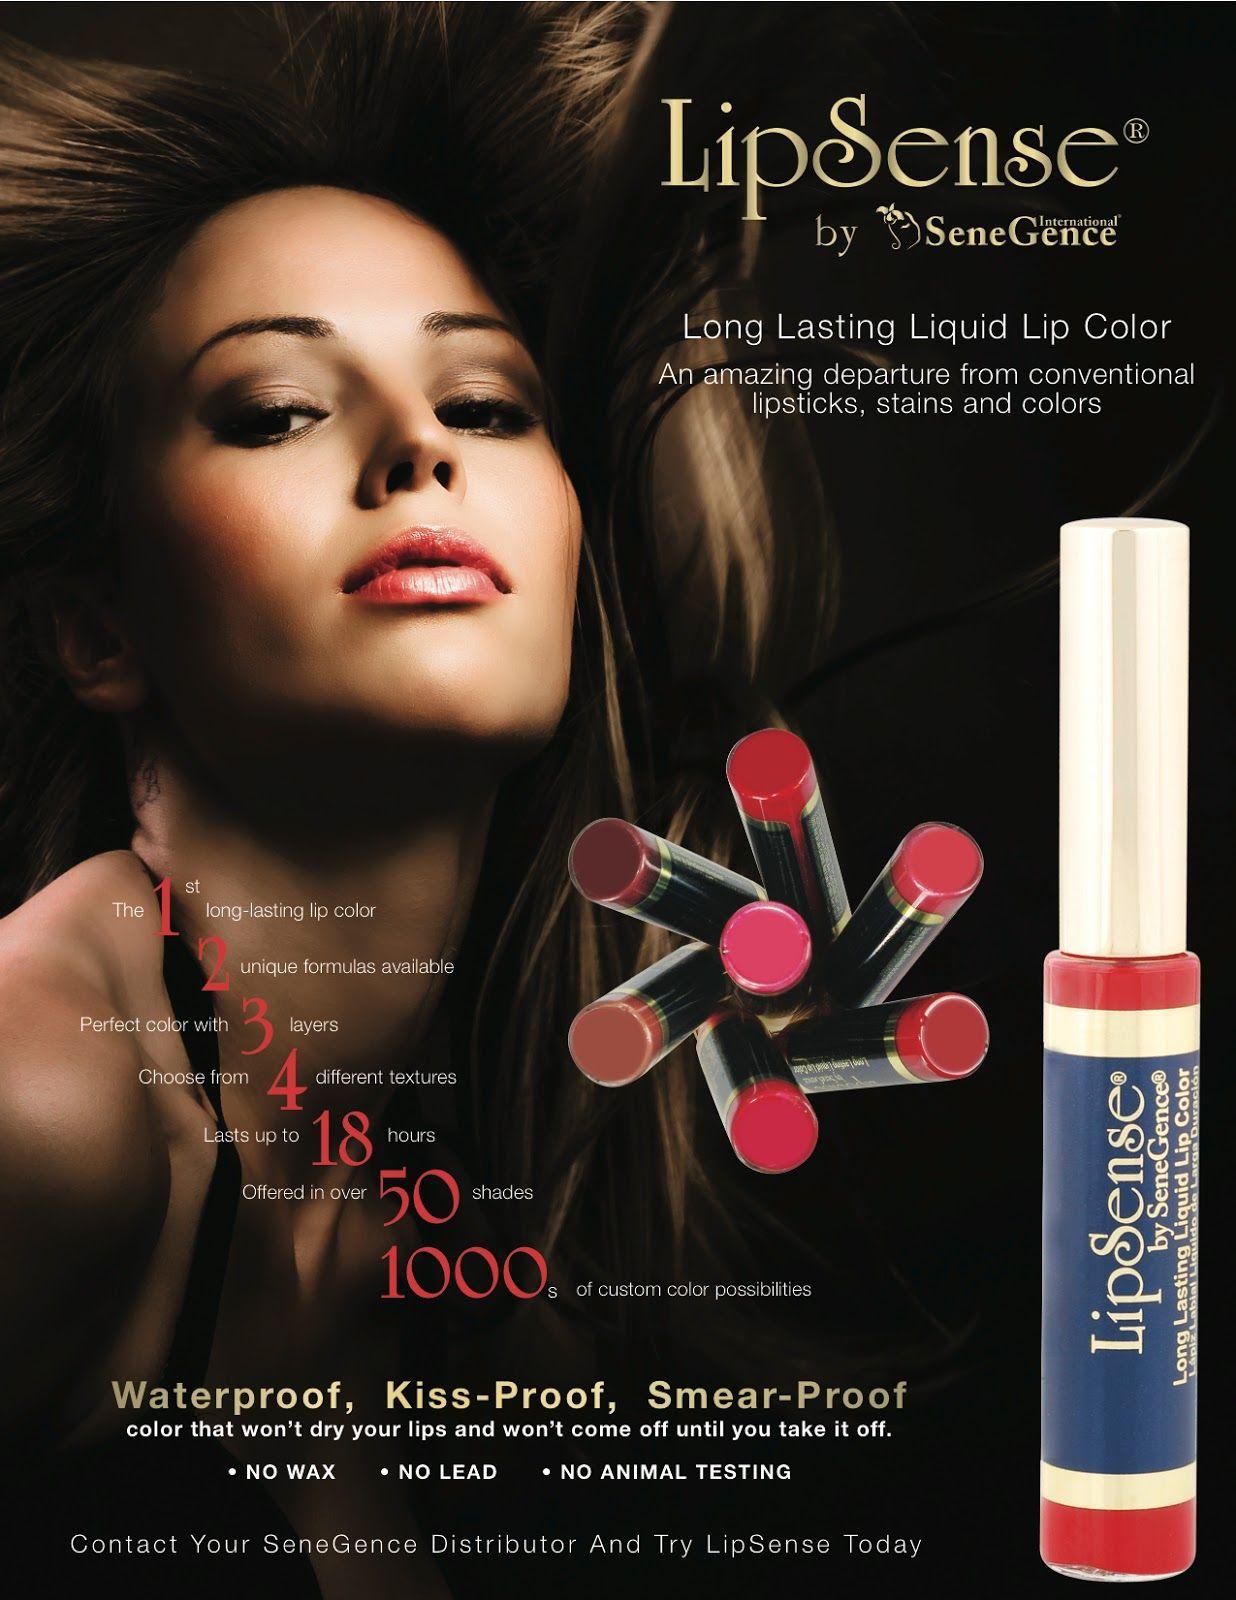 Lipsense Makeup: Amazing Colors To Choose From! LipSense!